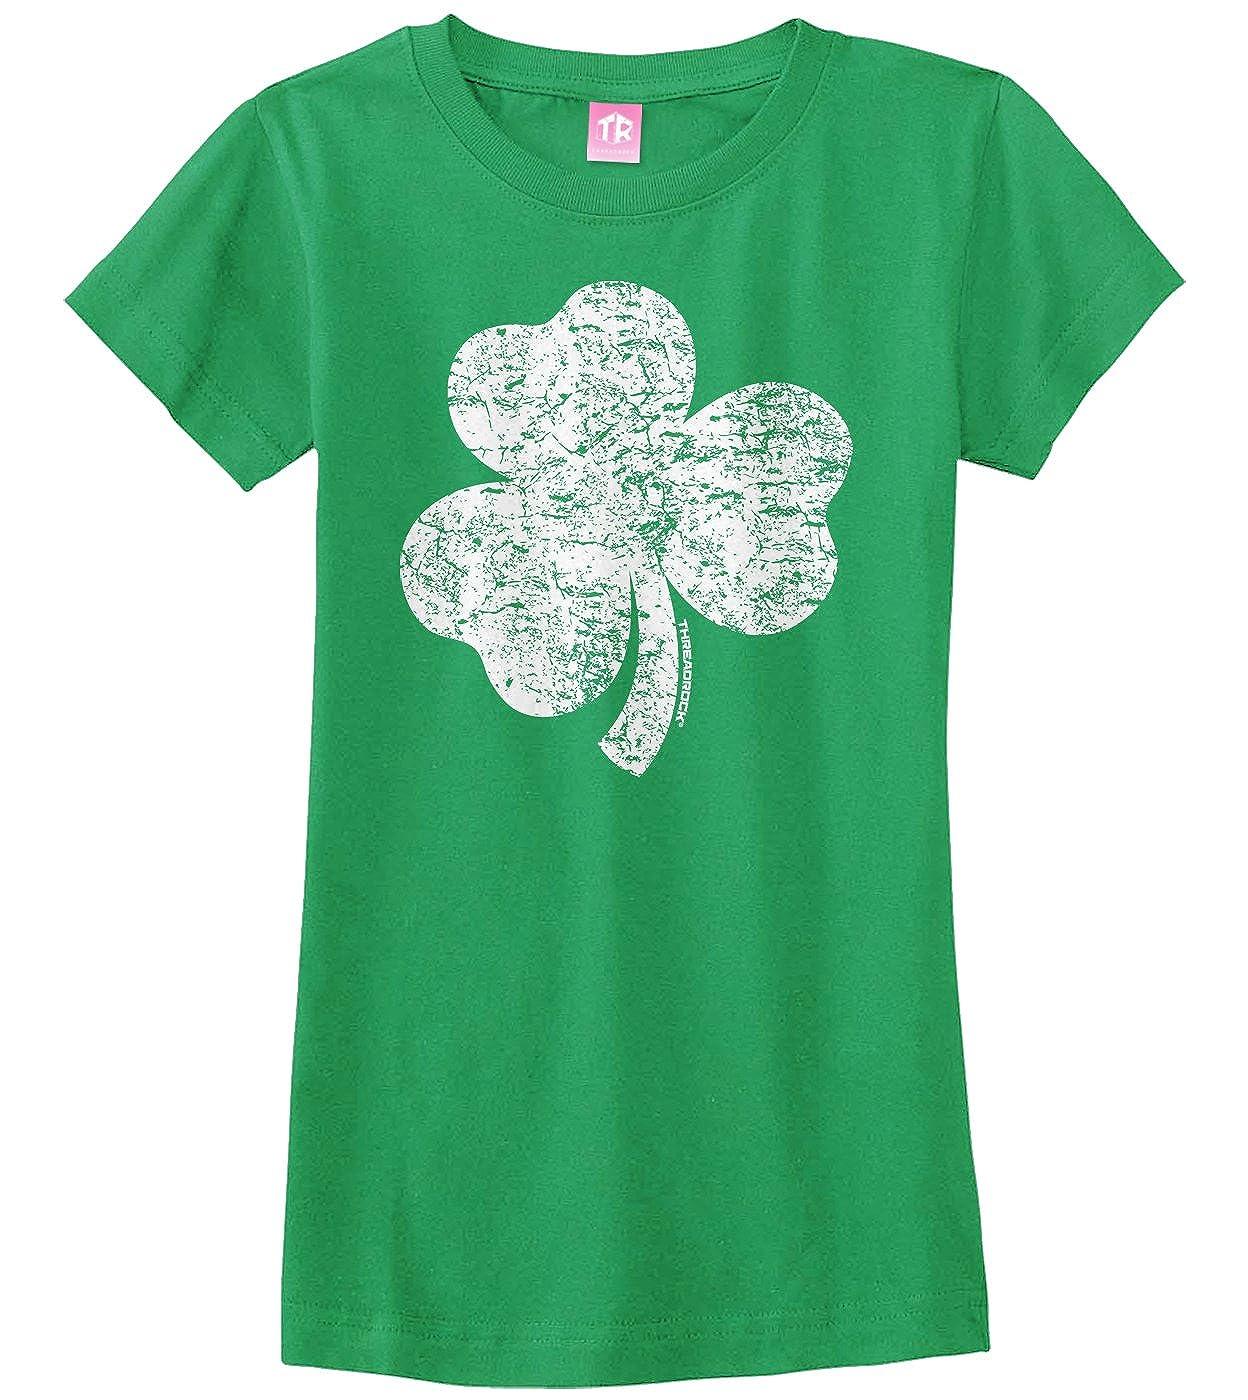 5ac42b009 Amazon.com: Threadrock Big Girls' Distressed Shamrock Fitted T-Shirt:  Clothing